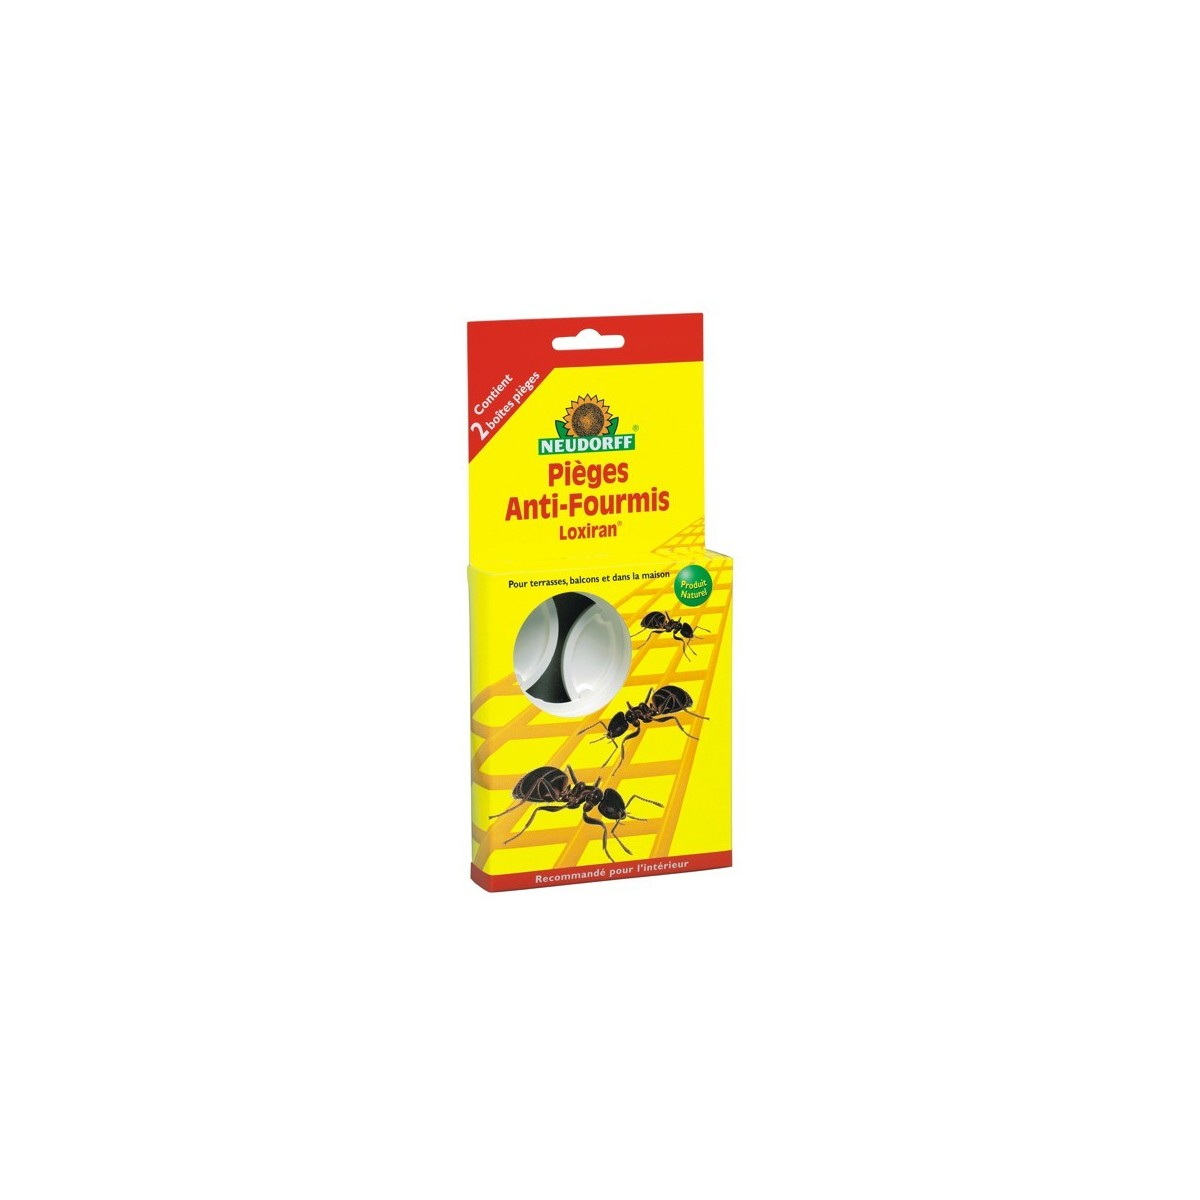 Pi ge anti fourmis neudorff achat vente anti fourmi - Piege a fourmis ...